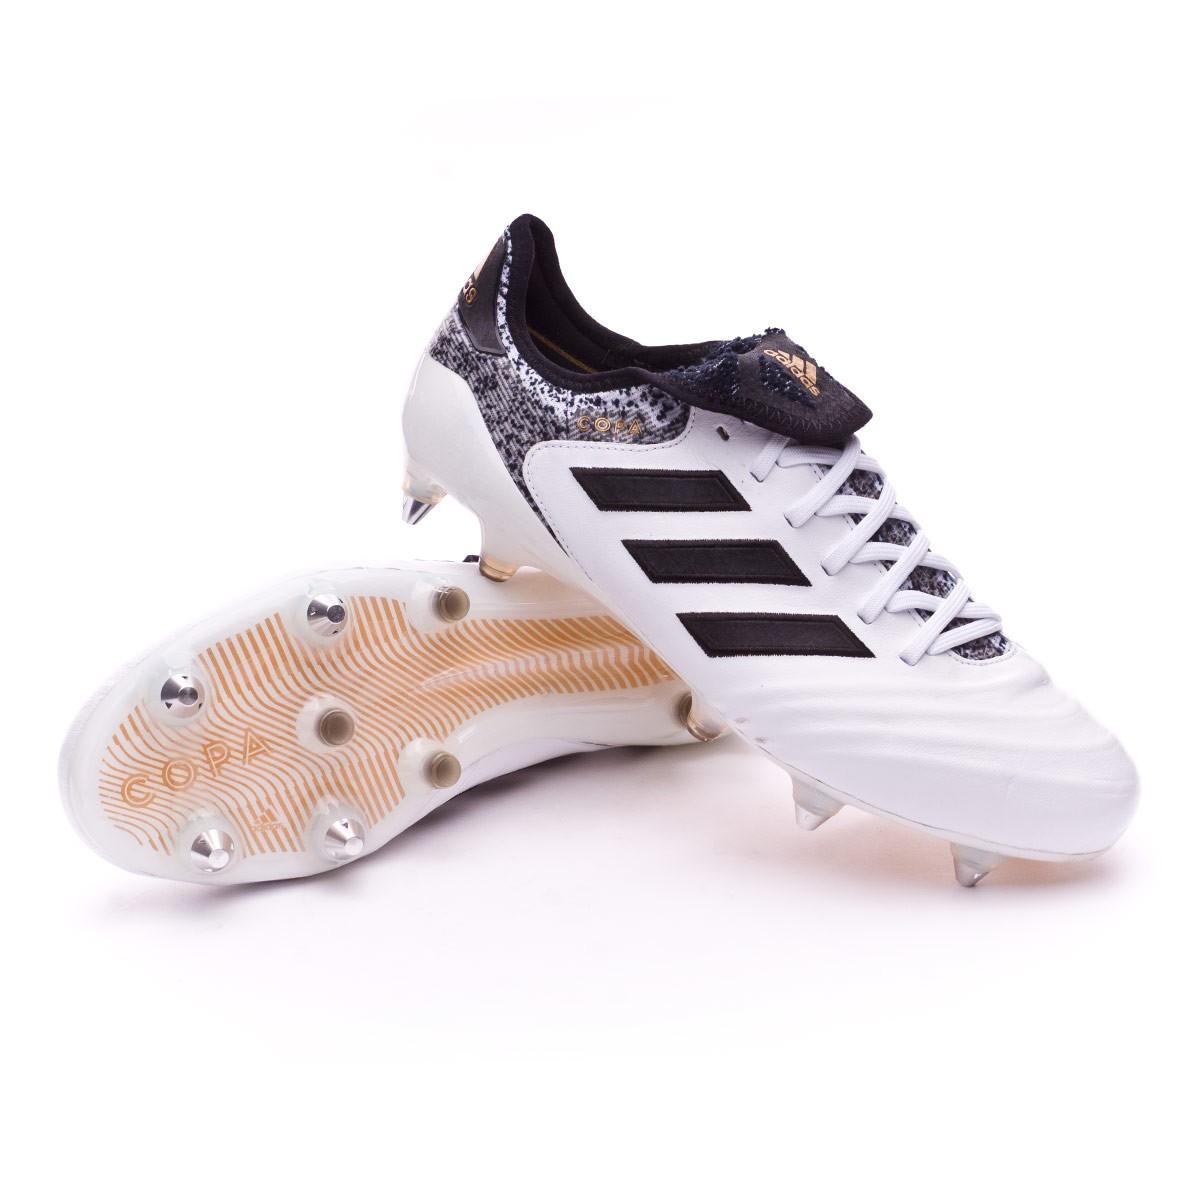 4278dc962d4f adidas Copa 18.1 SG Football Boots. White-Core black-Tactile gold metallic  ...